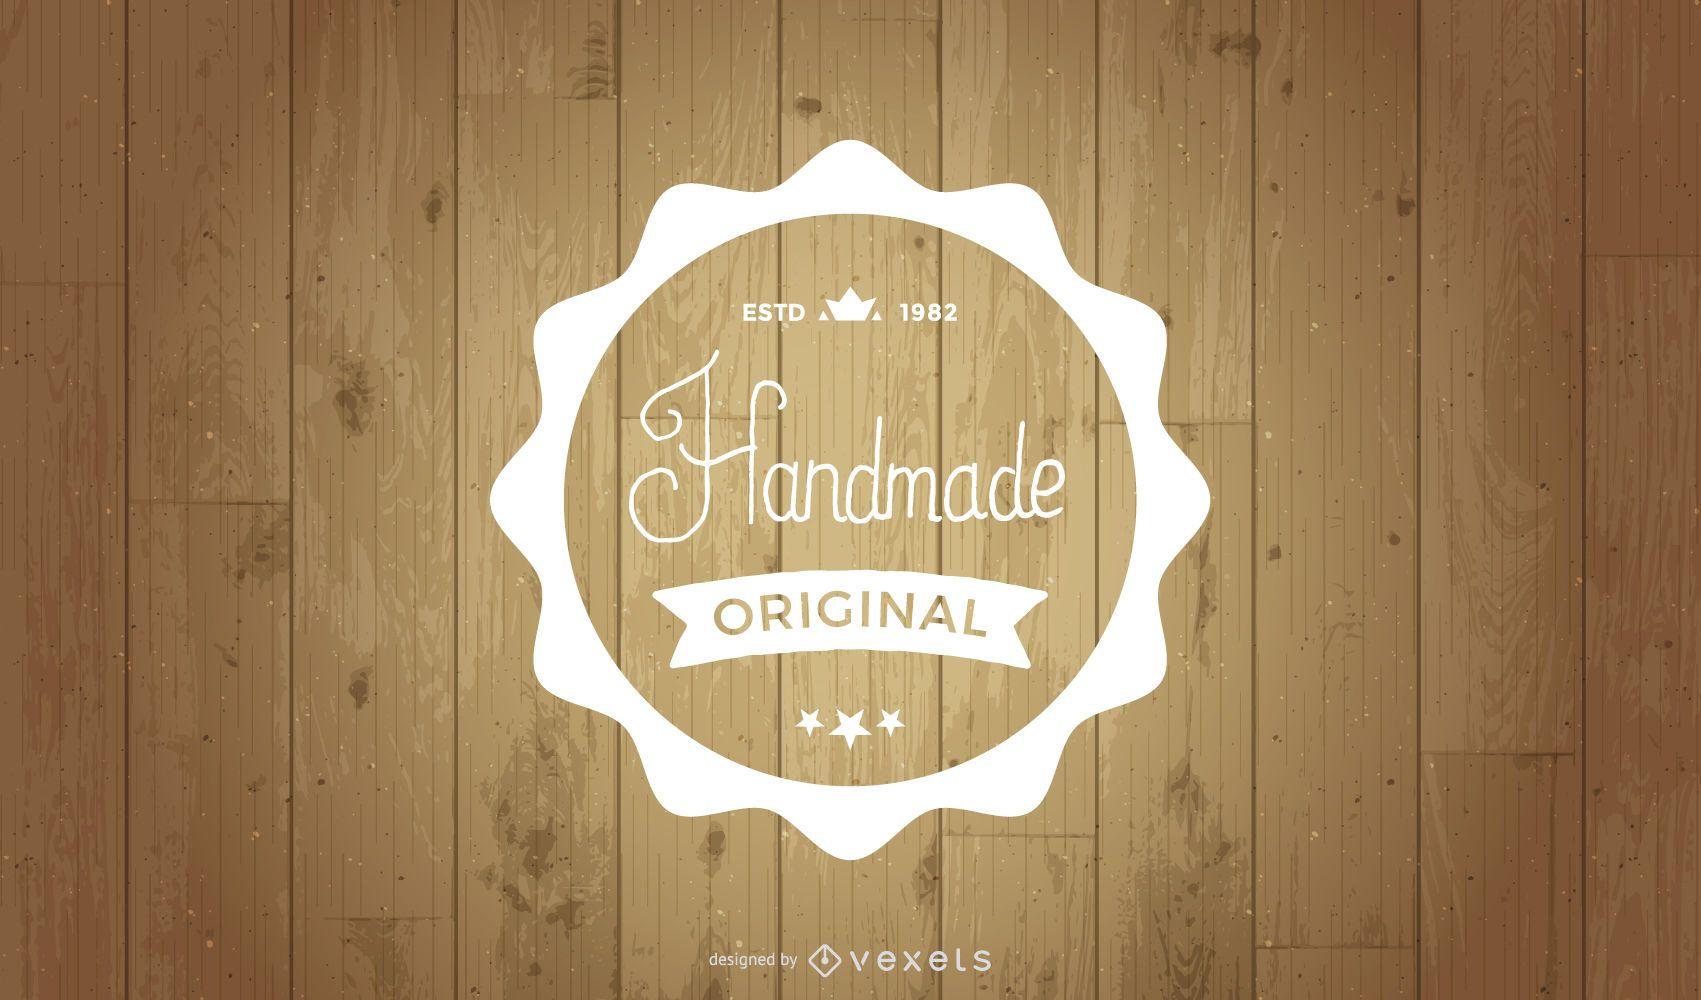 Retro Label on Wooden Background